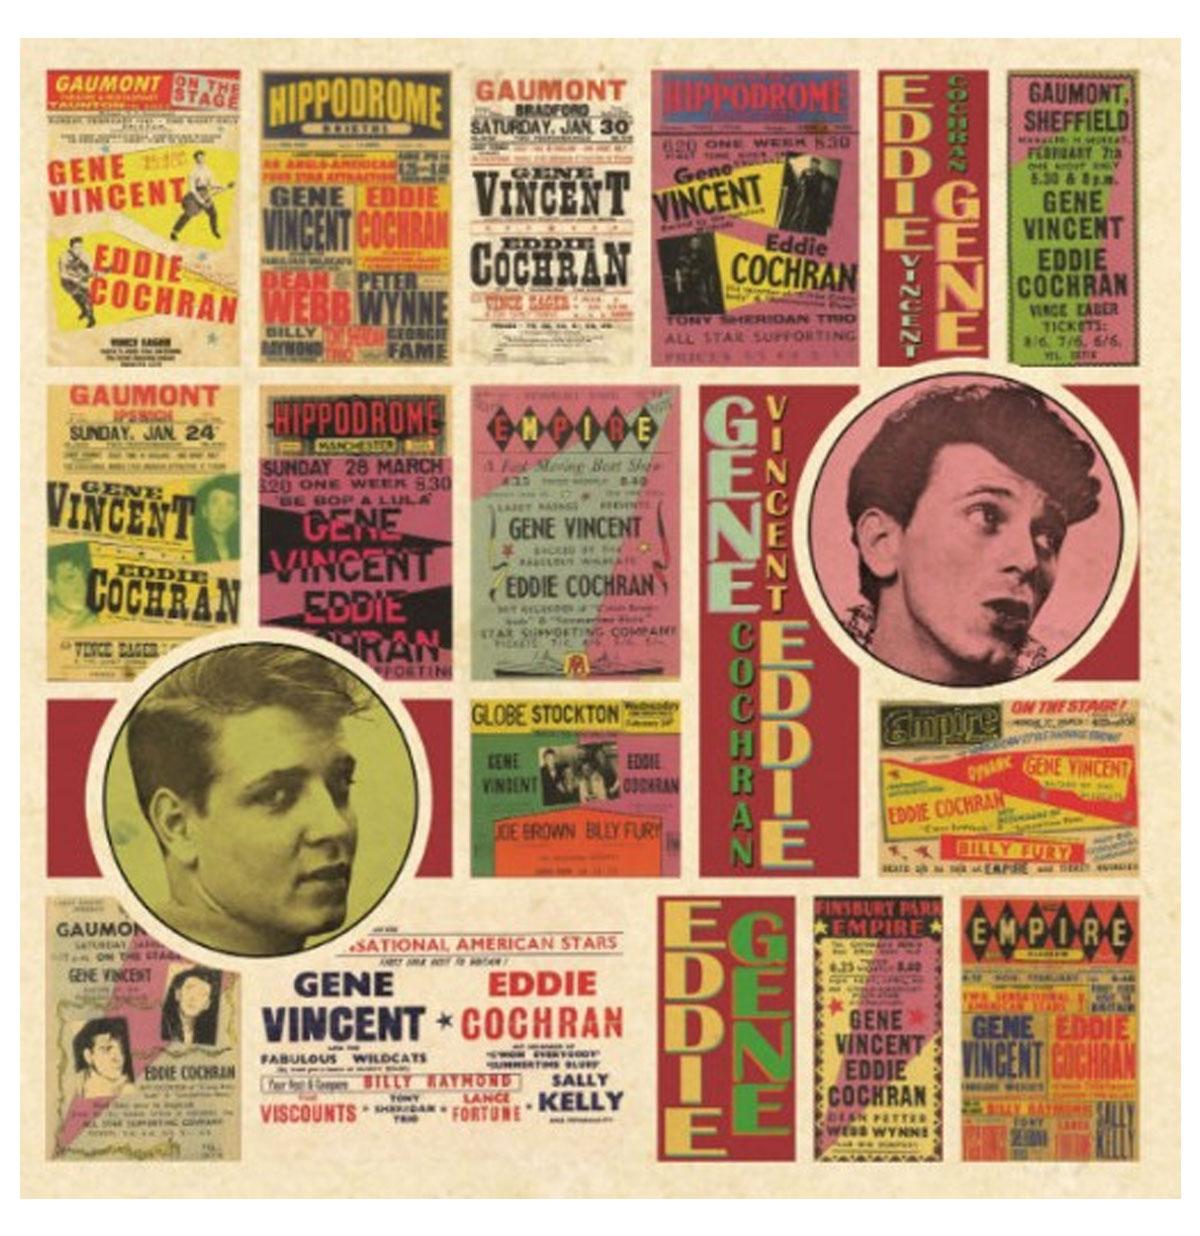 Eddie Cochran & Gene Vincent - Saturday Club LP